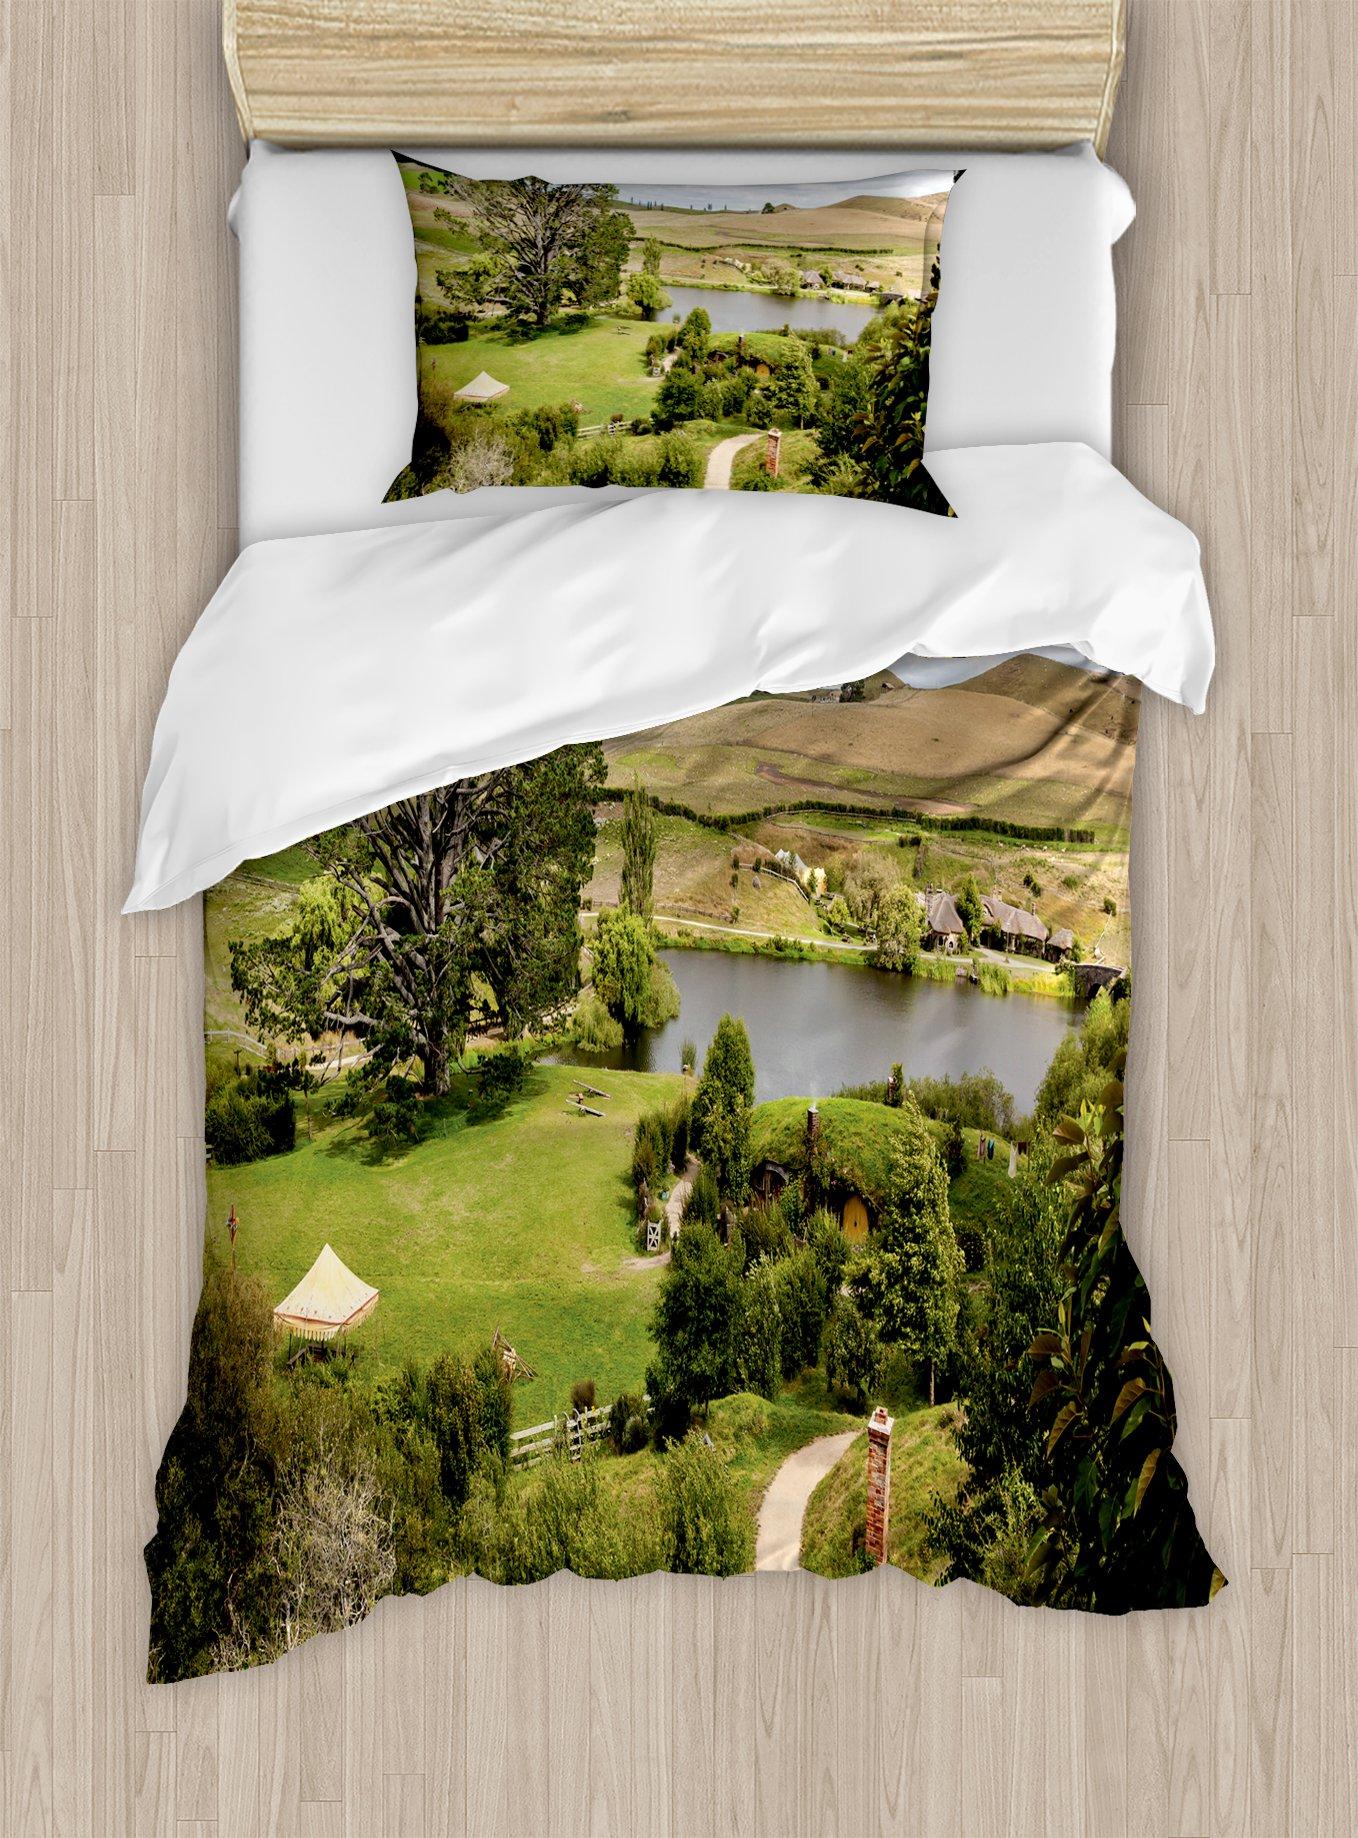 Ambesonne Hobbits Duvet Cover Set Twin Size, Overhill Matamata New Zealand Movie Set Hobbit Land Village Movie Set Image, Decorative 2 Piece Bedding Set with 1 Pillow Sham, Green Brown